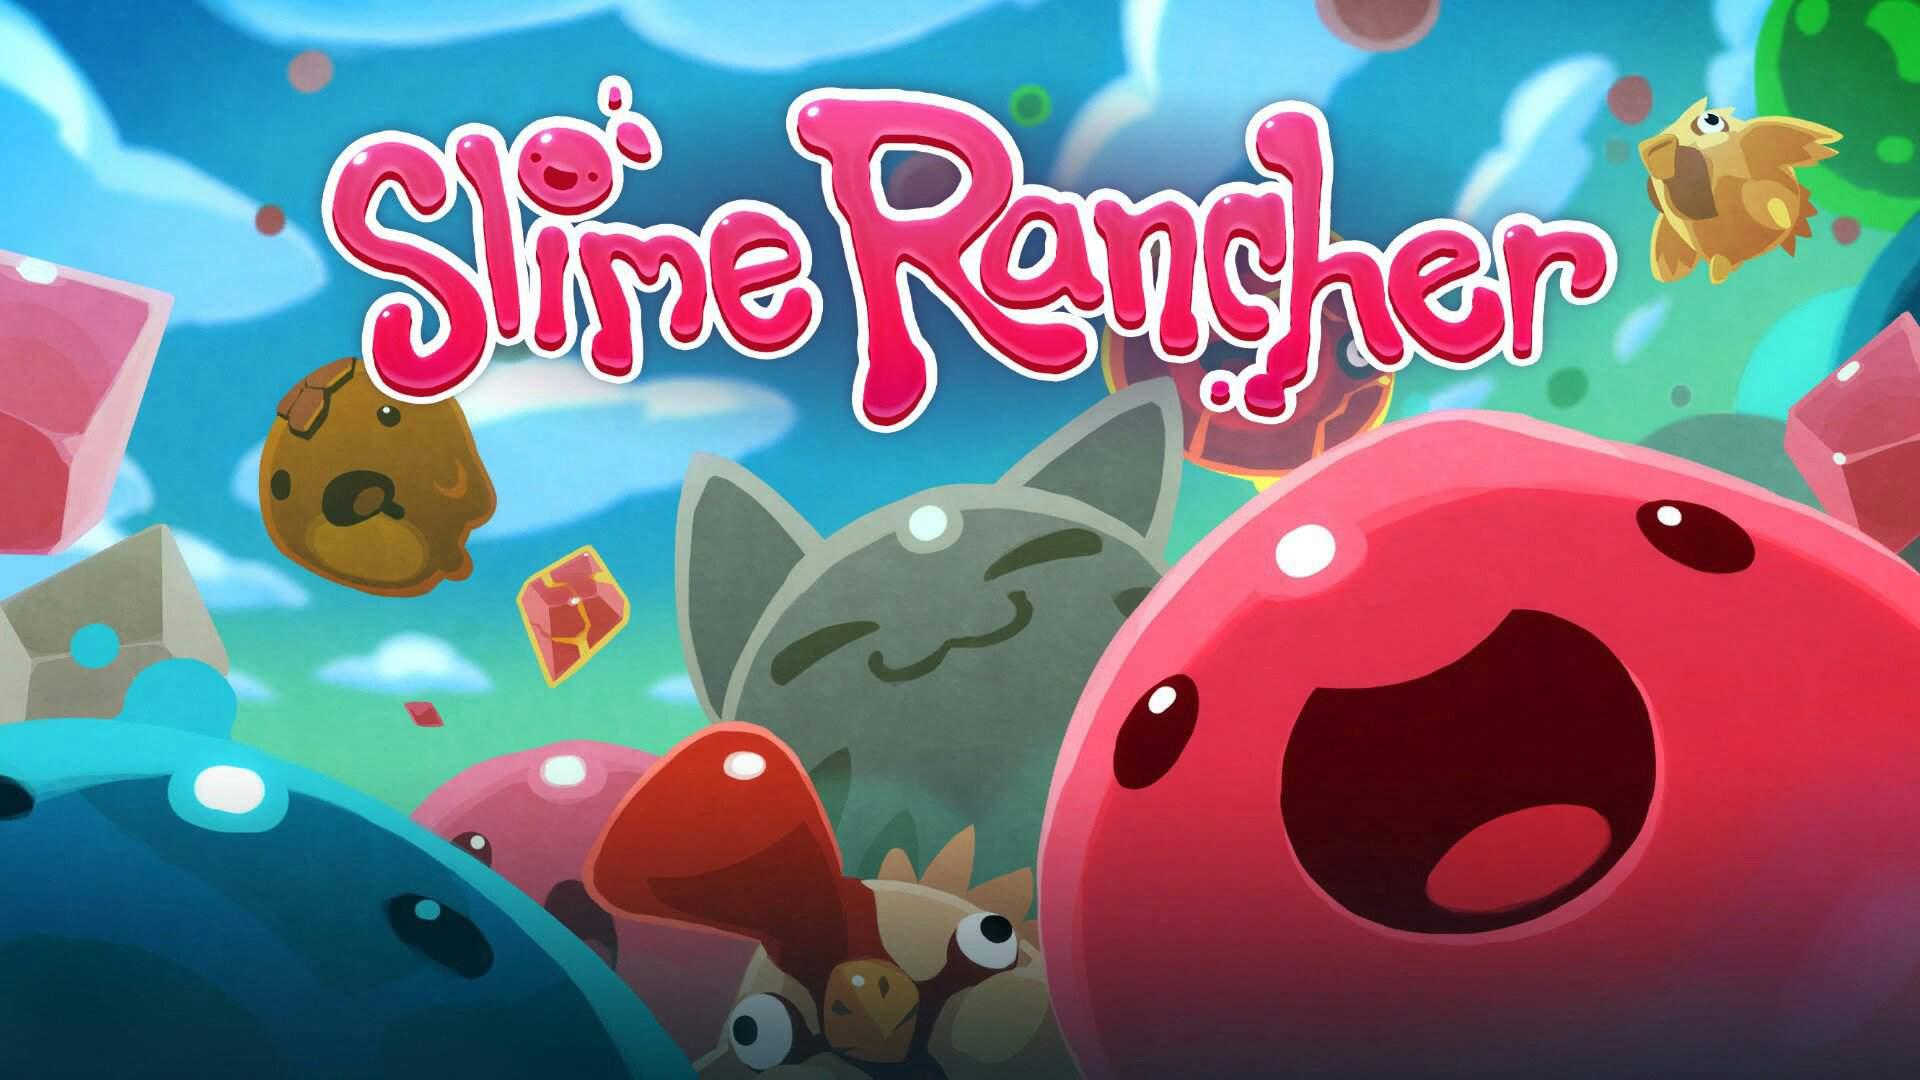 Slime Rancher